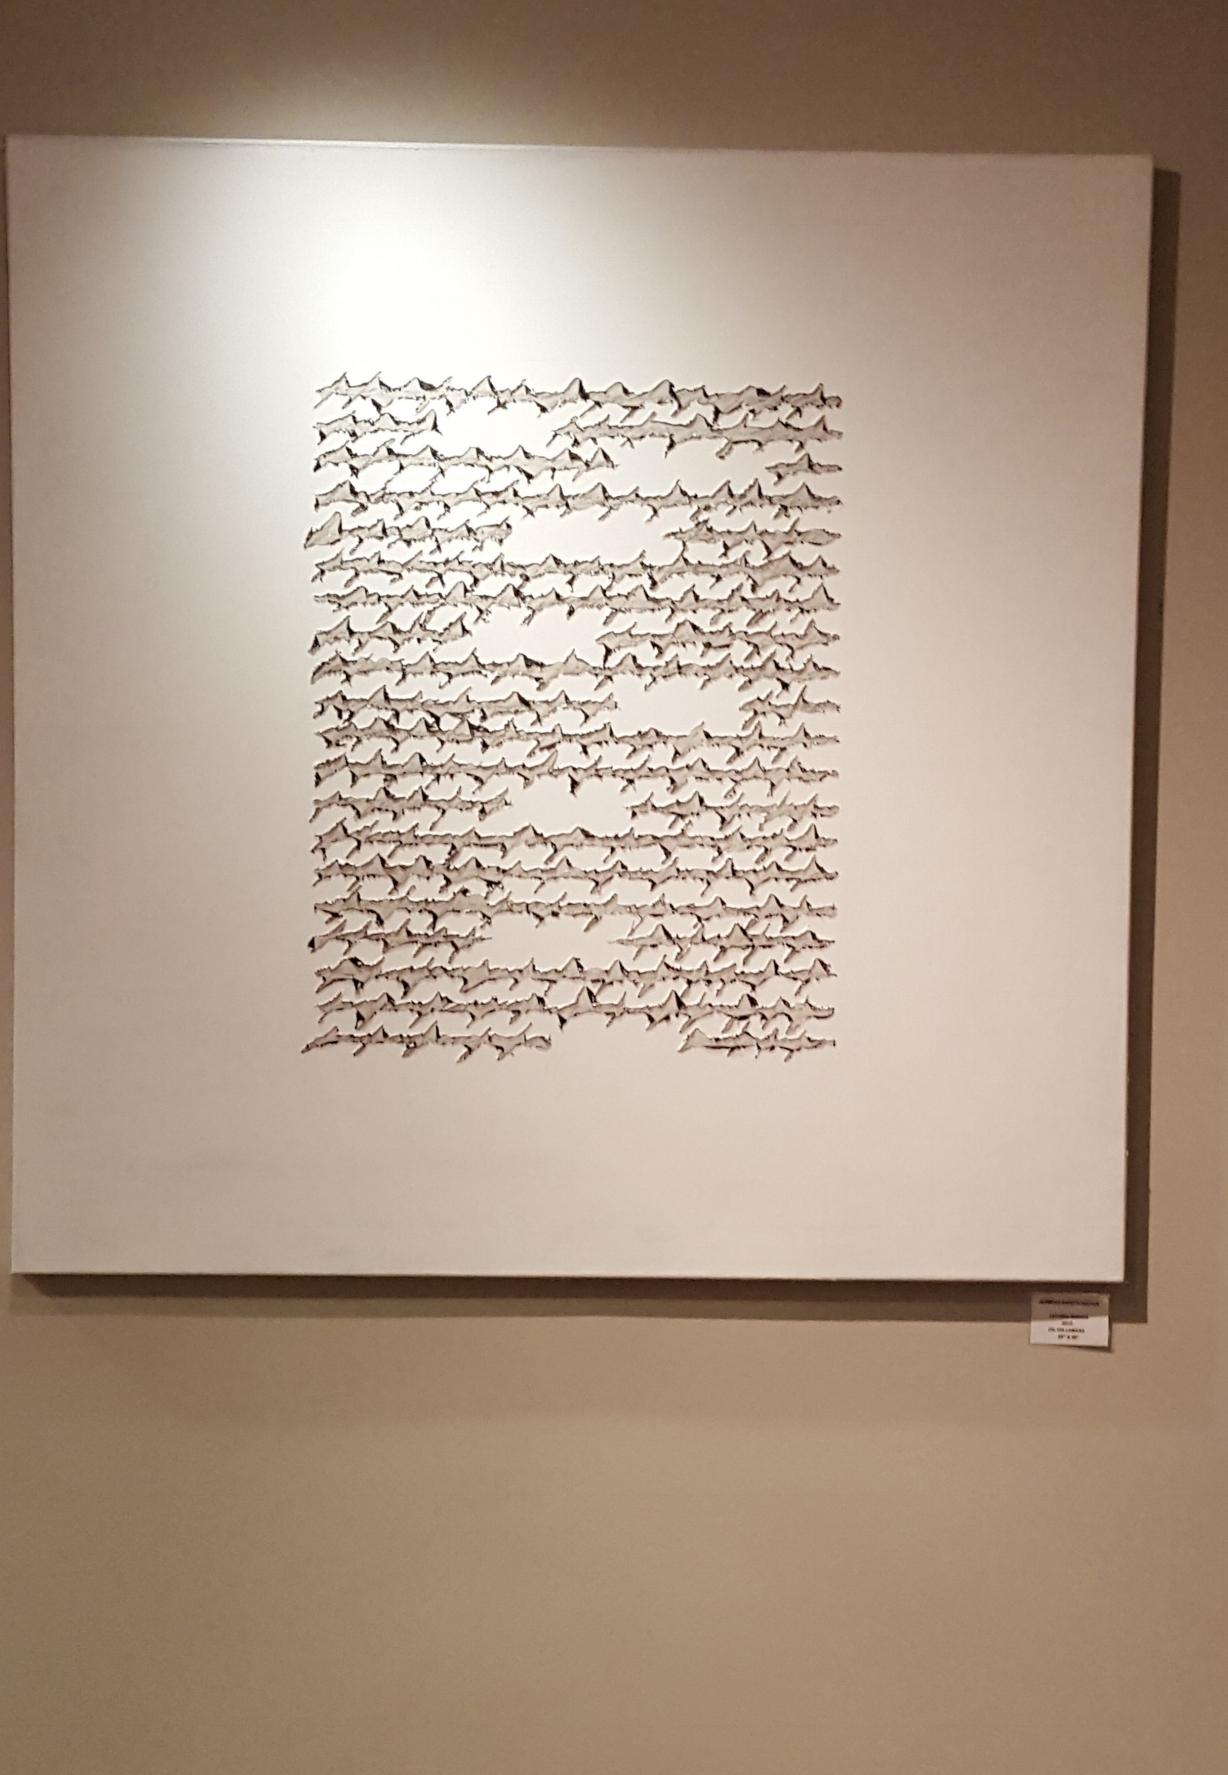 lettera bianca Mogol (1) - Copy.jpg